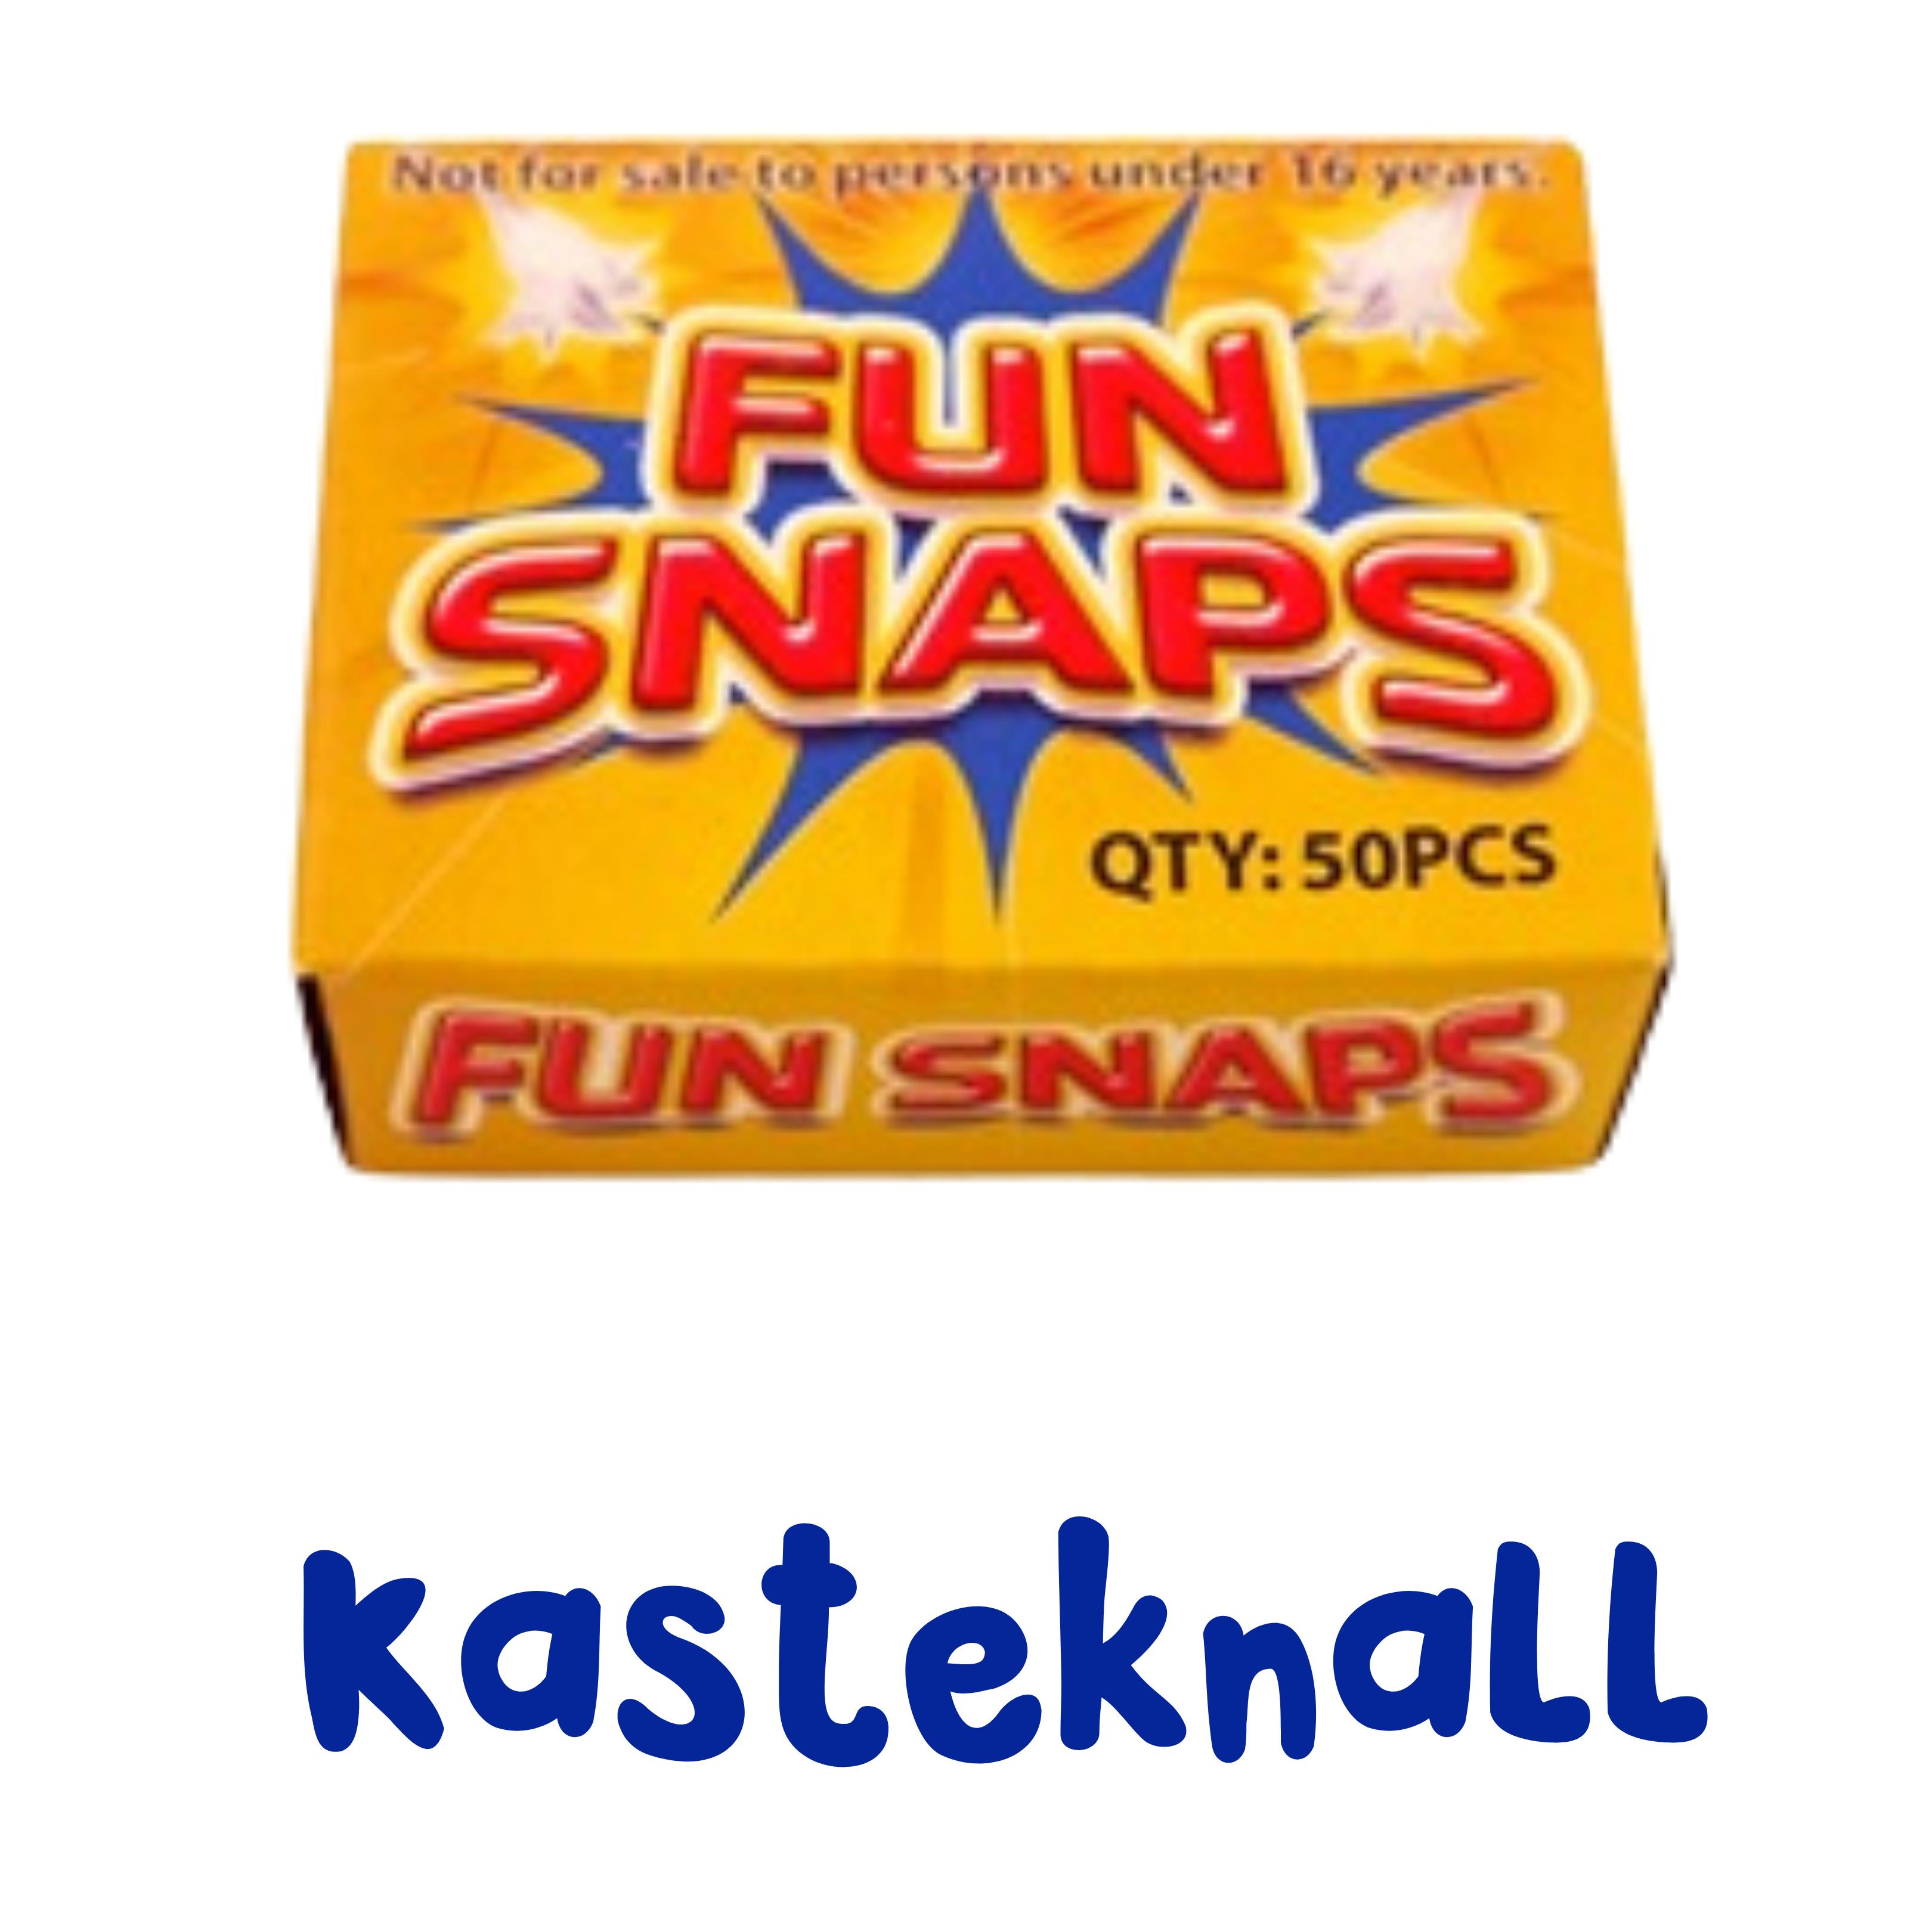 Fun Snaps Kasteknall